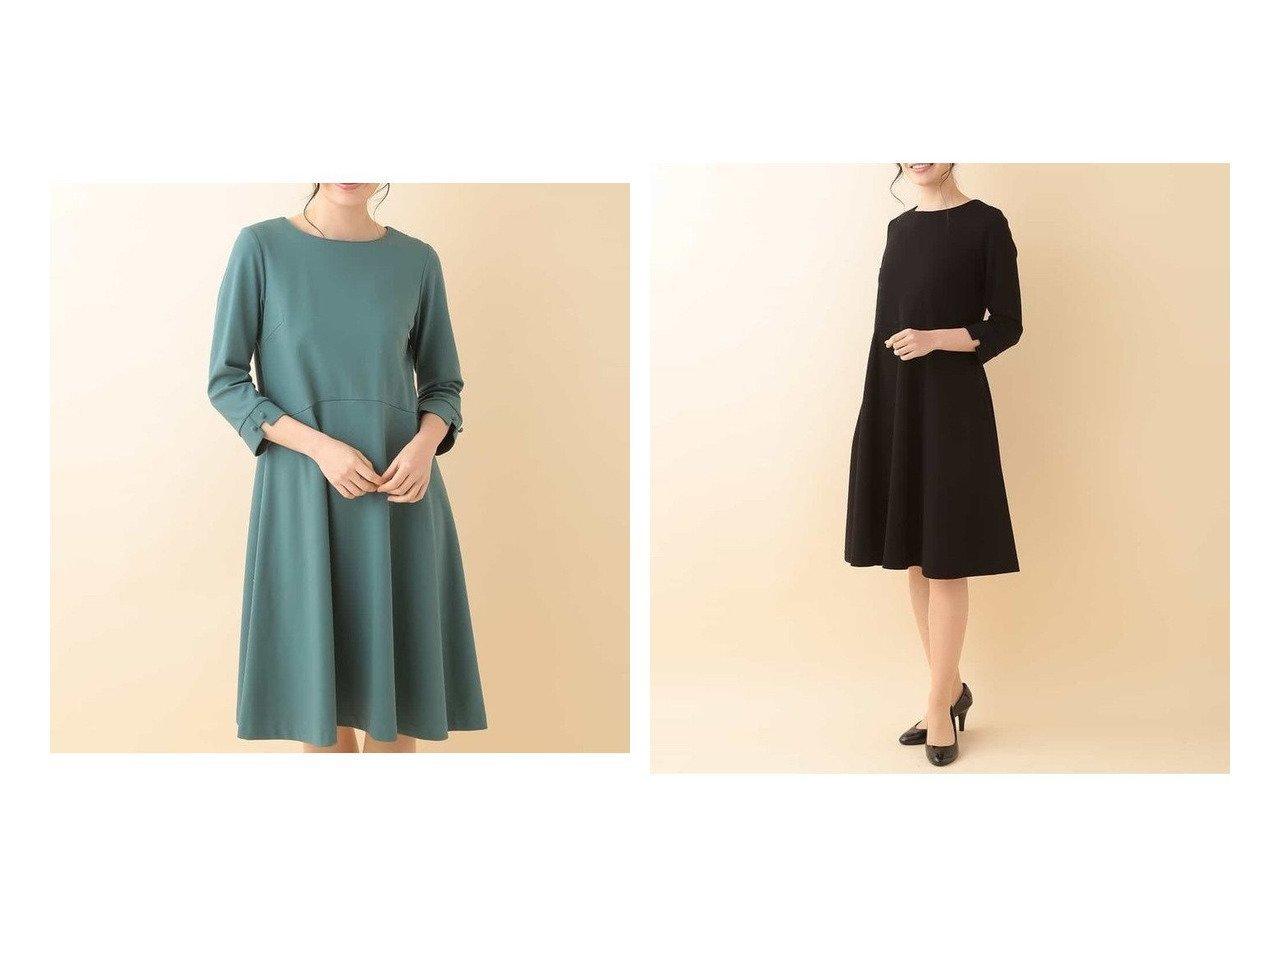 【Jocomomola/ホコモモラ】のGRACEFUL ポンチフレアワンピース ワンピース・ドレスのおすすめ!人気、トレンド・レディースファッションの通販 | レディースファッション・服の通販 founy(ファニー)